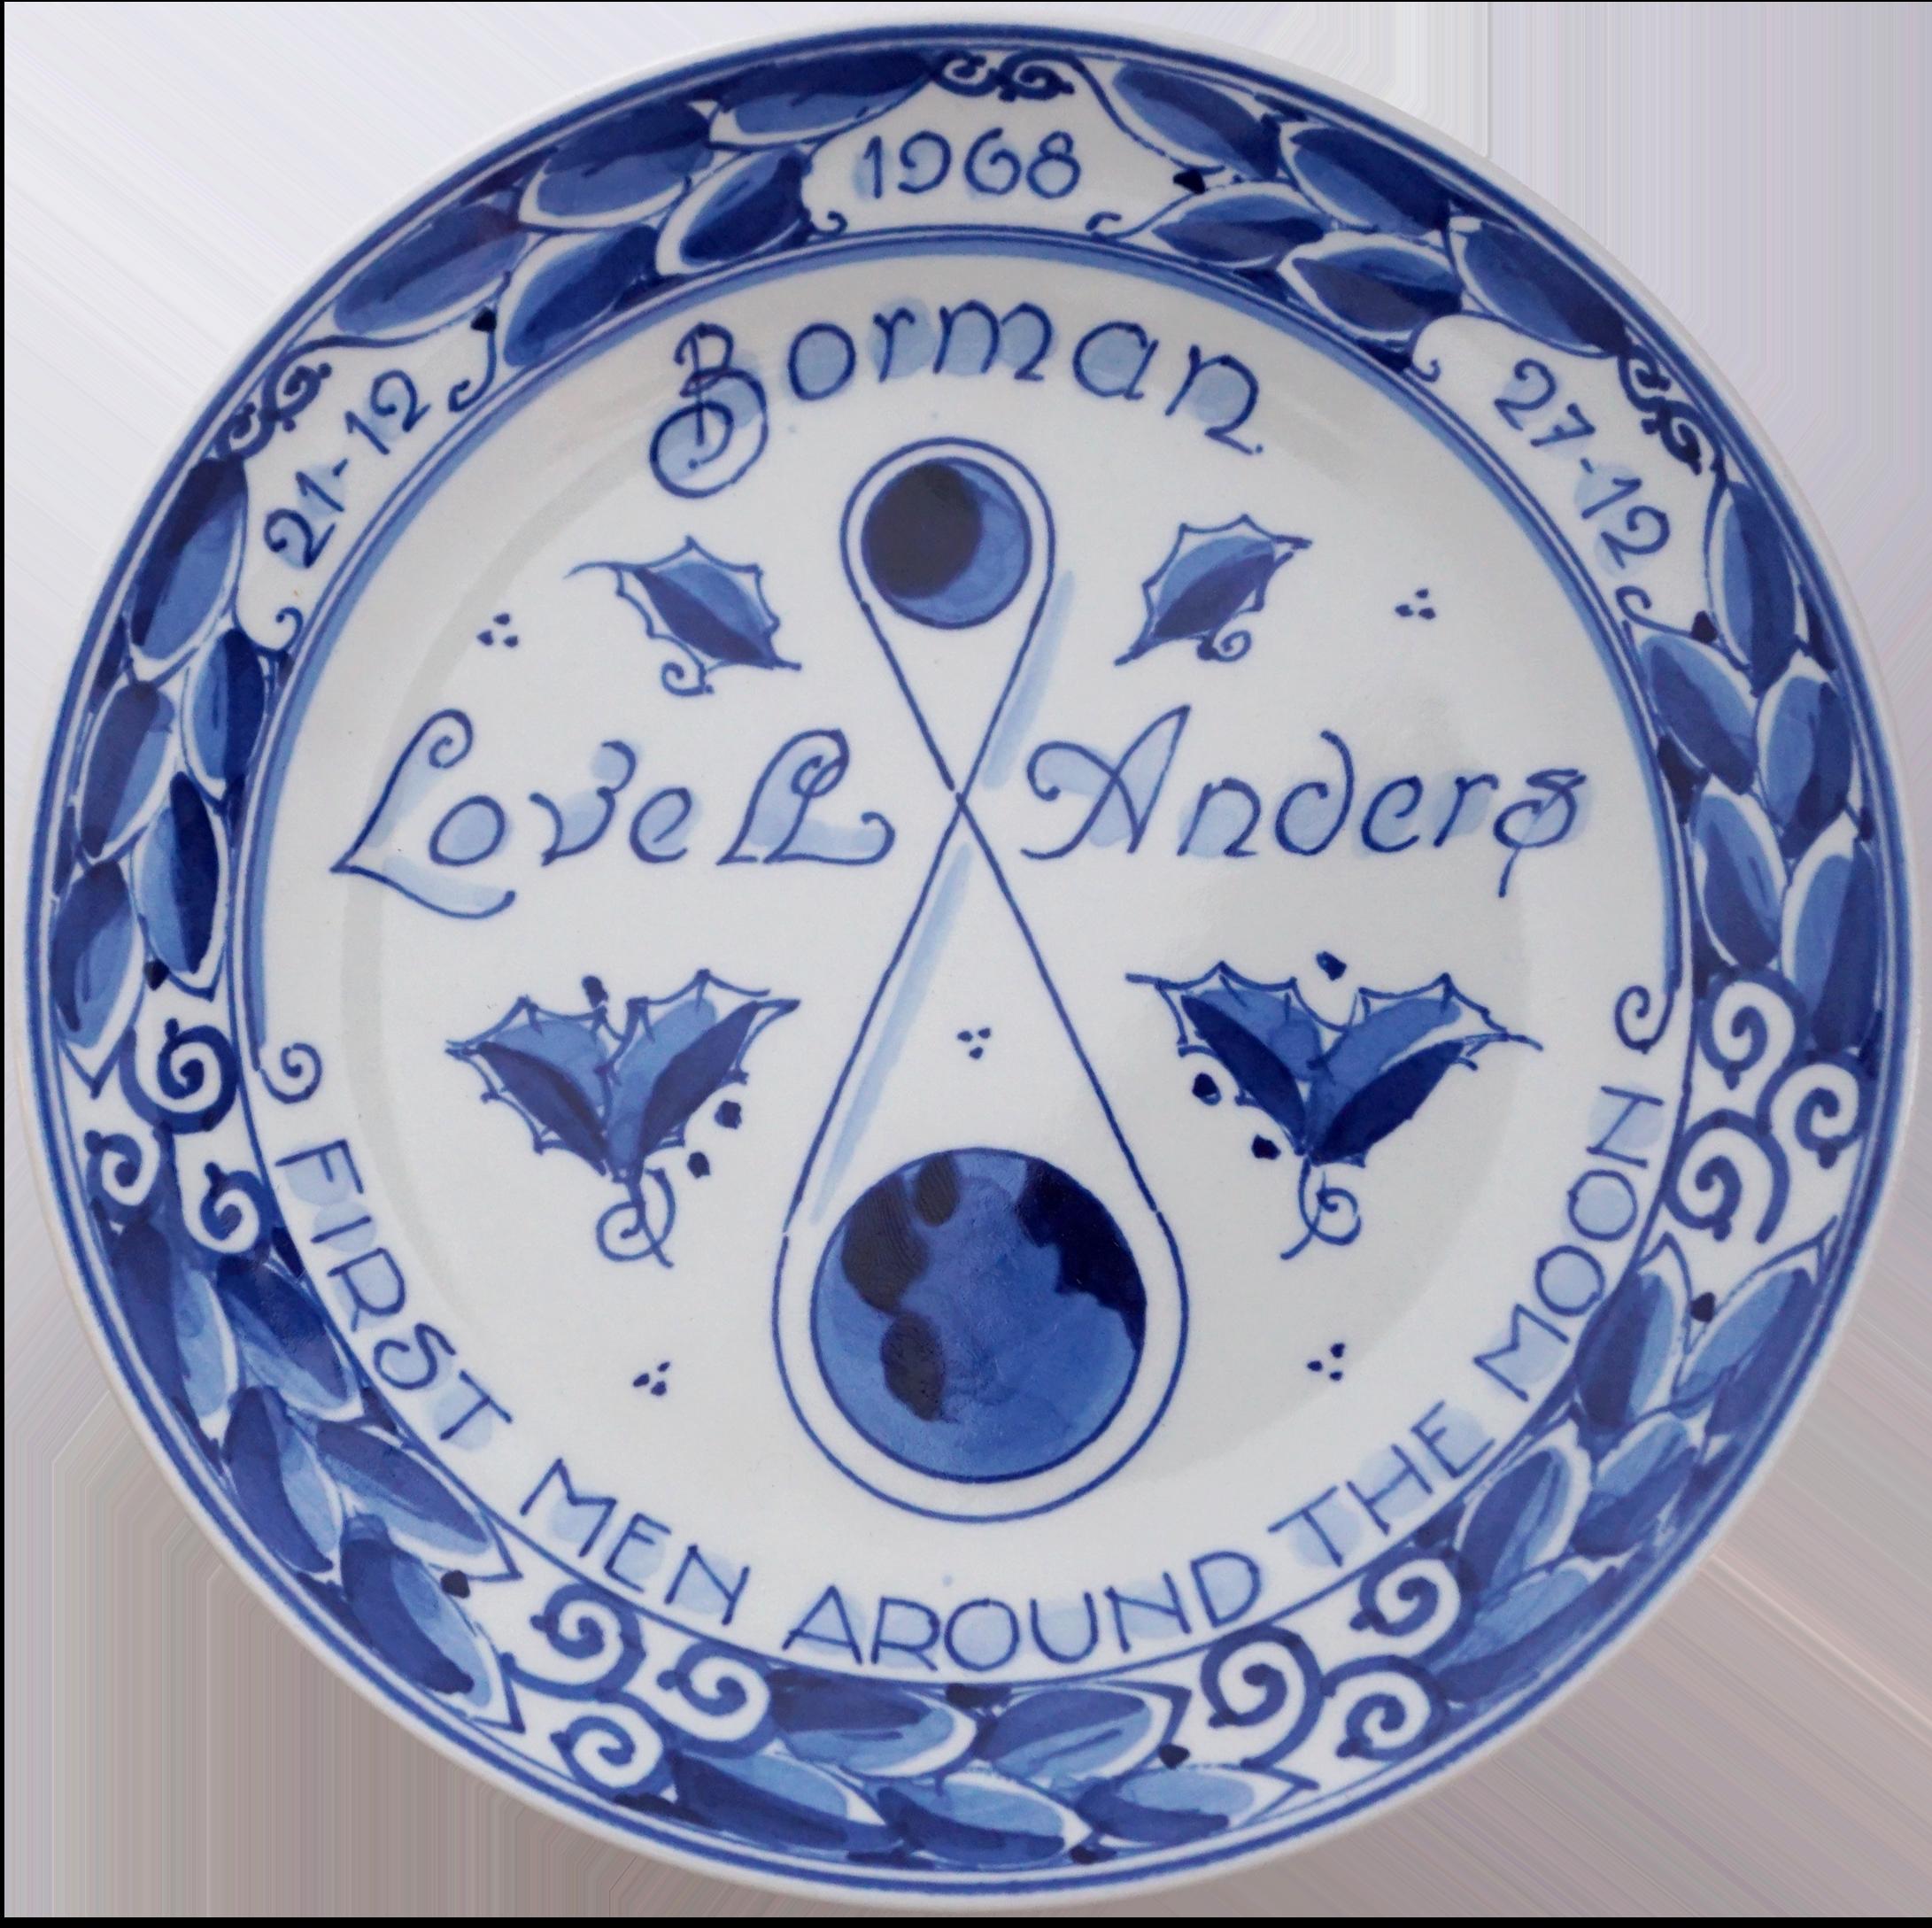 ERM-XXXX-EPHEMERA-BLUE_PLATE-FRONT.png